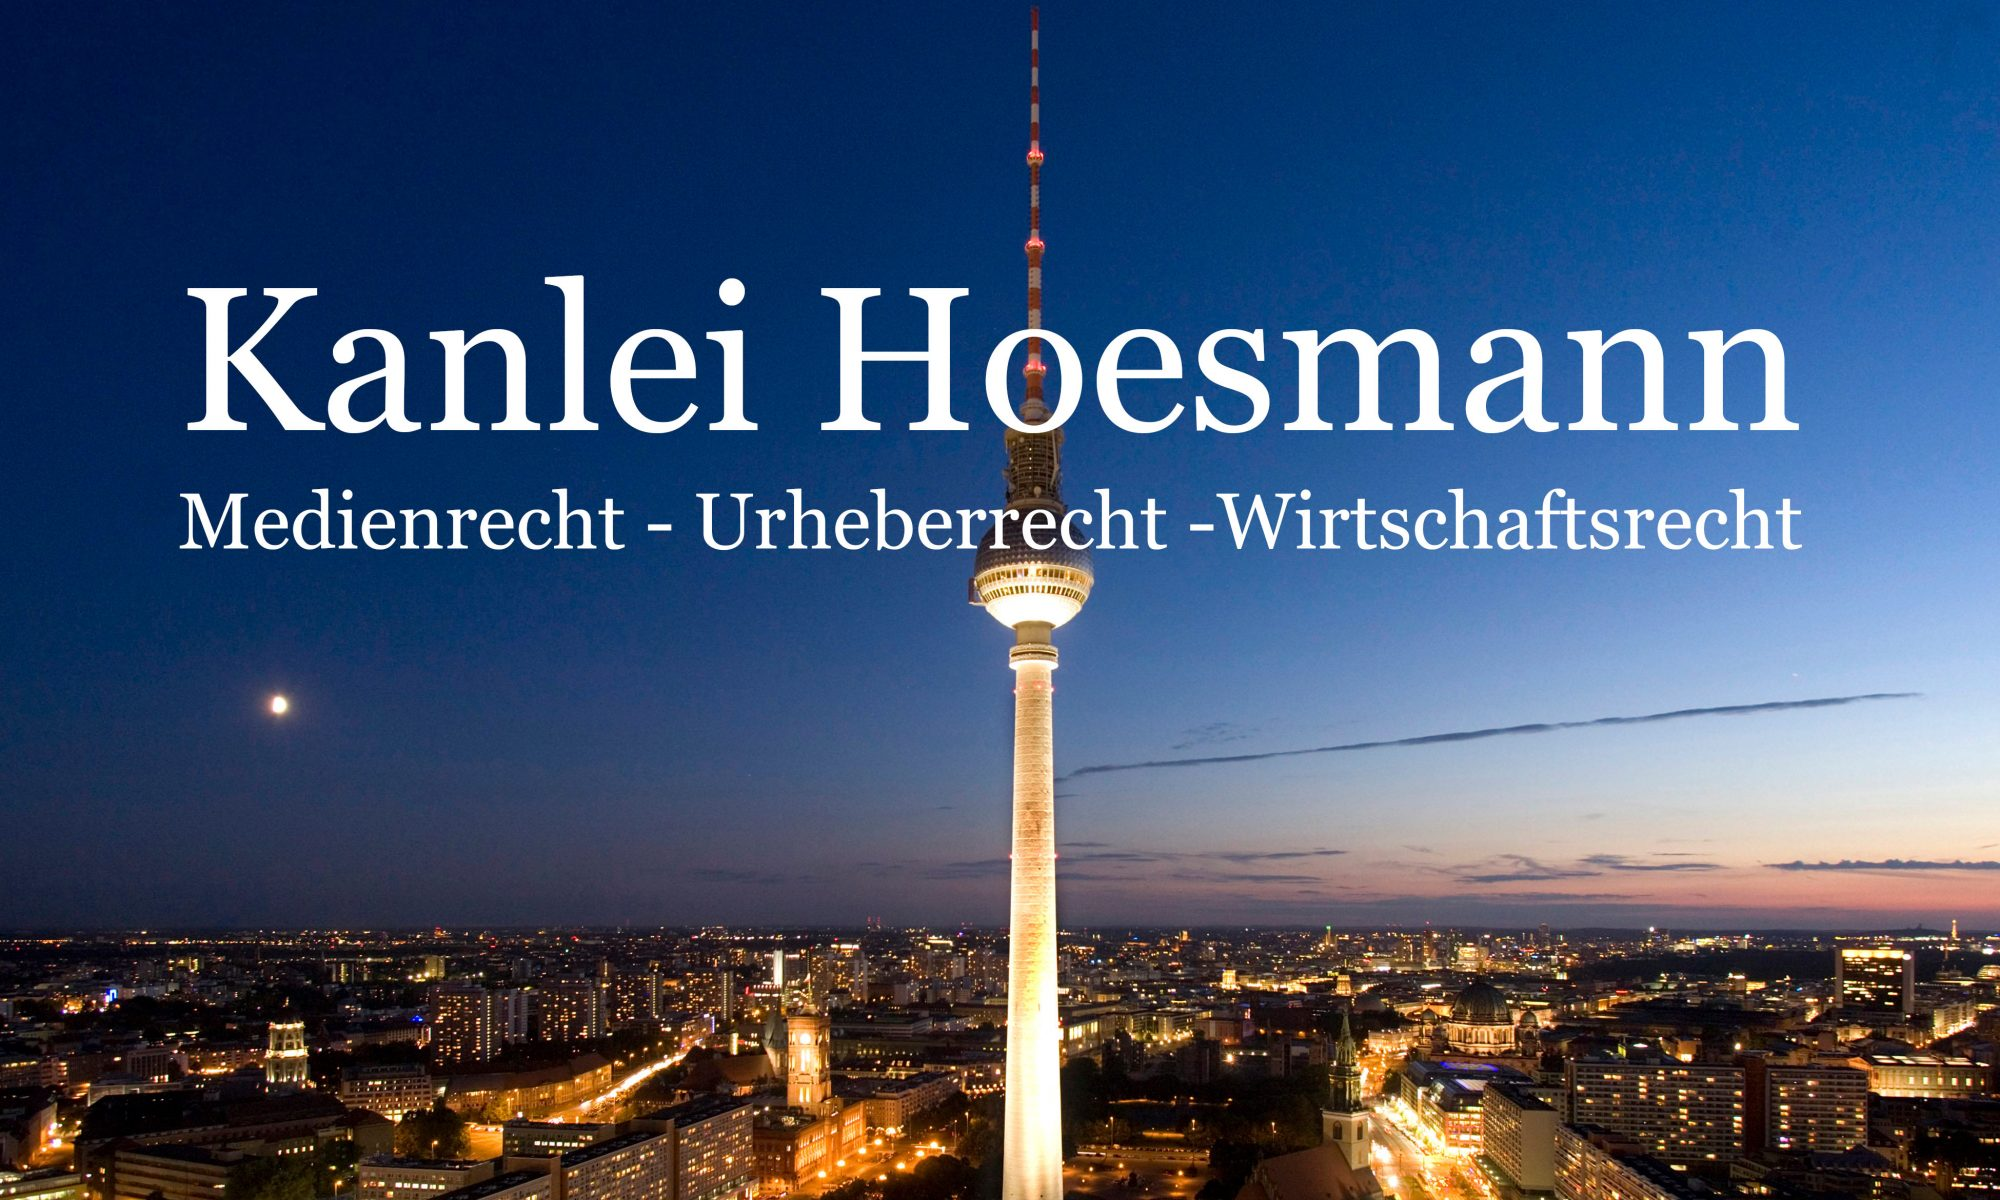 Kanzlei Hoesmann